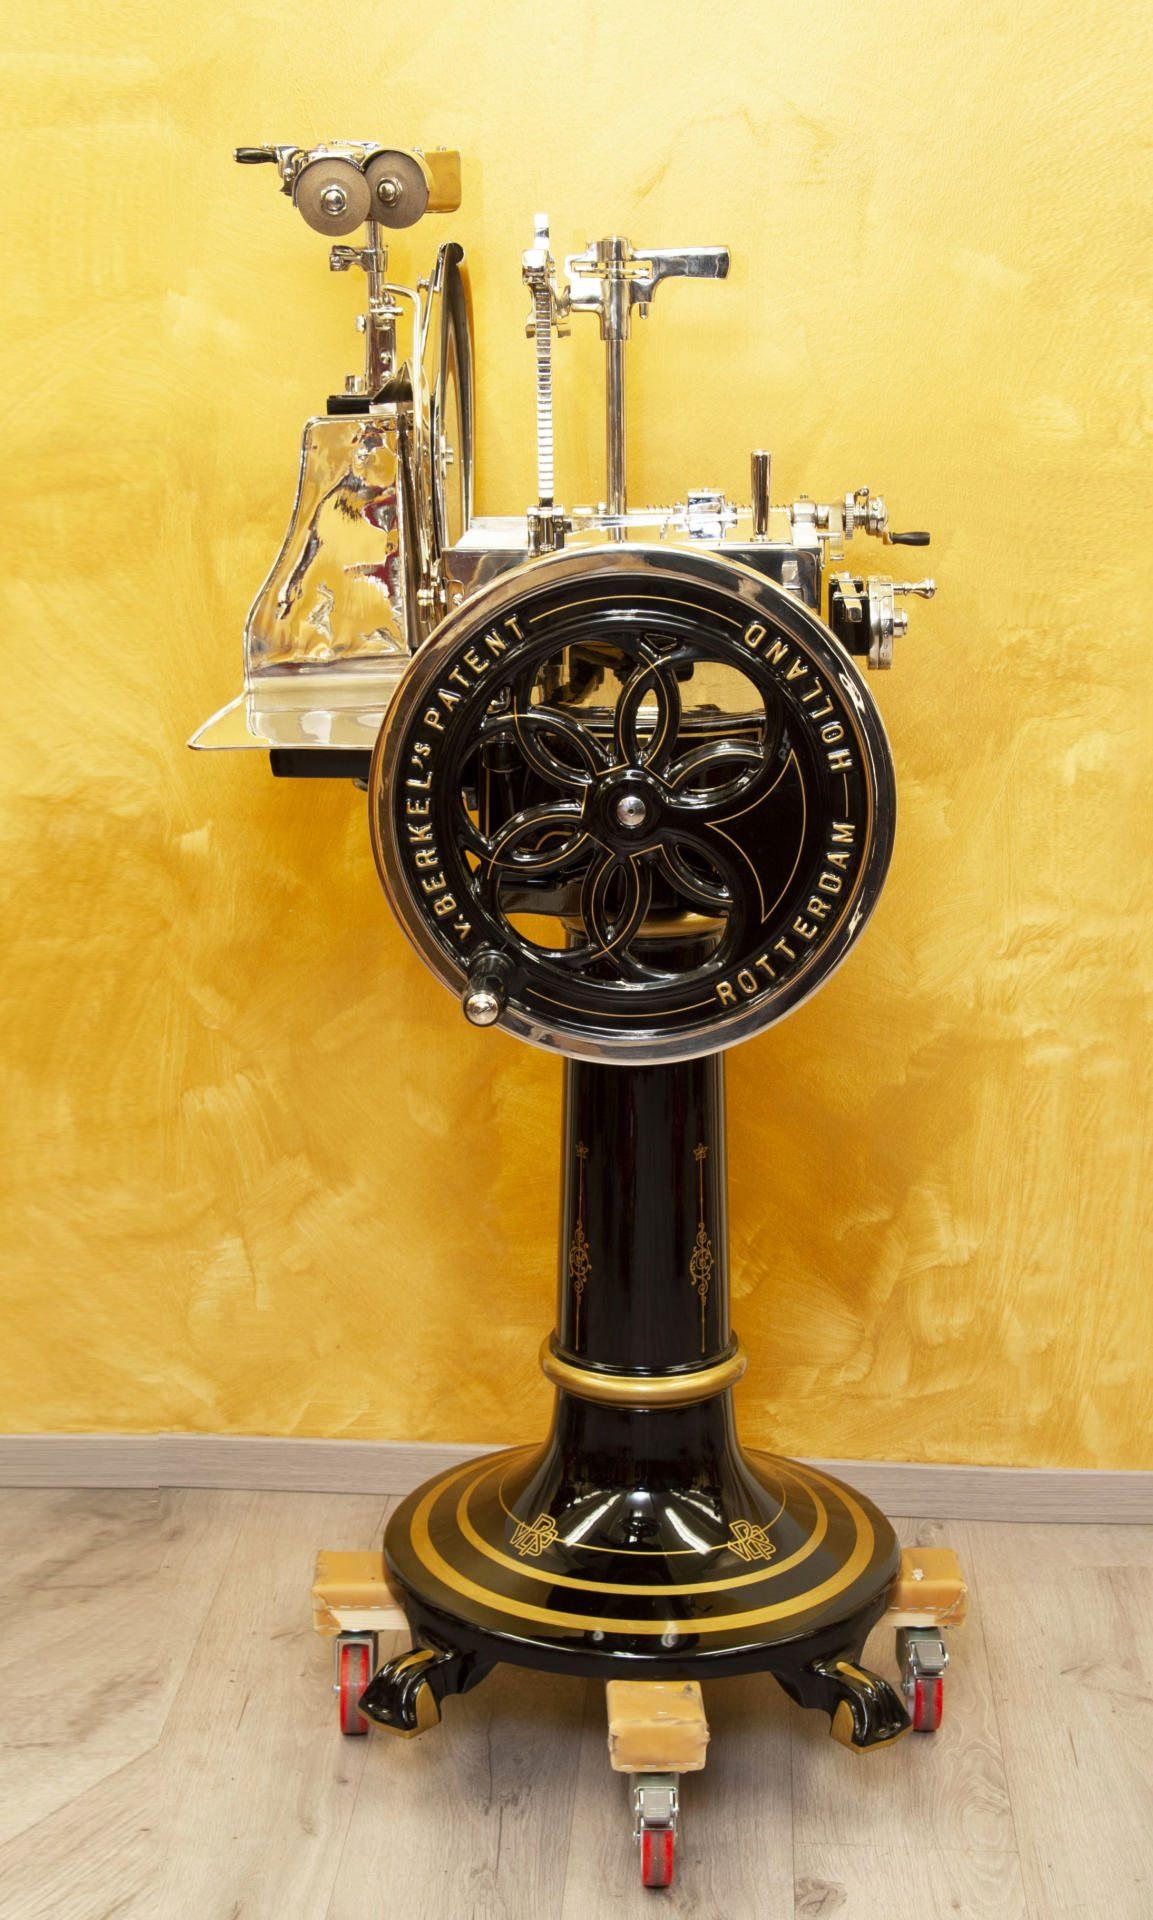 Berkel slicing machine model 3 black